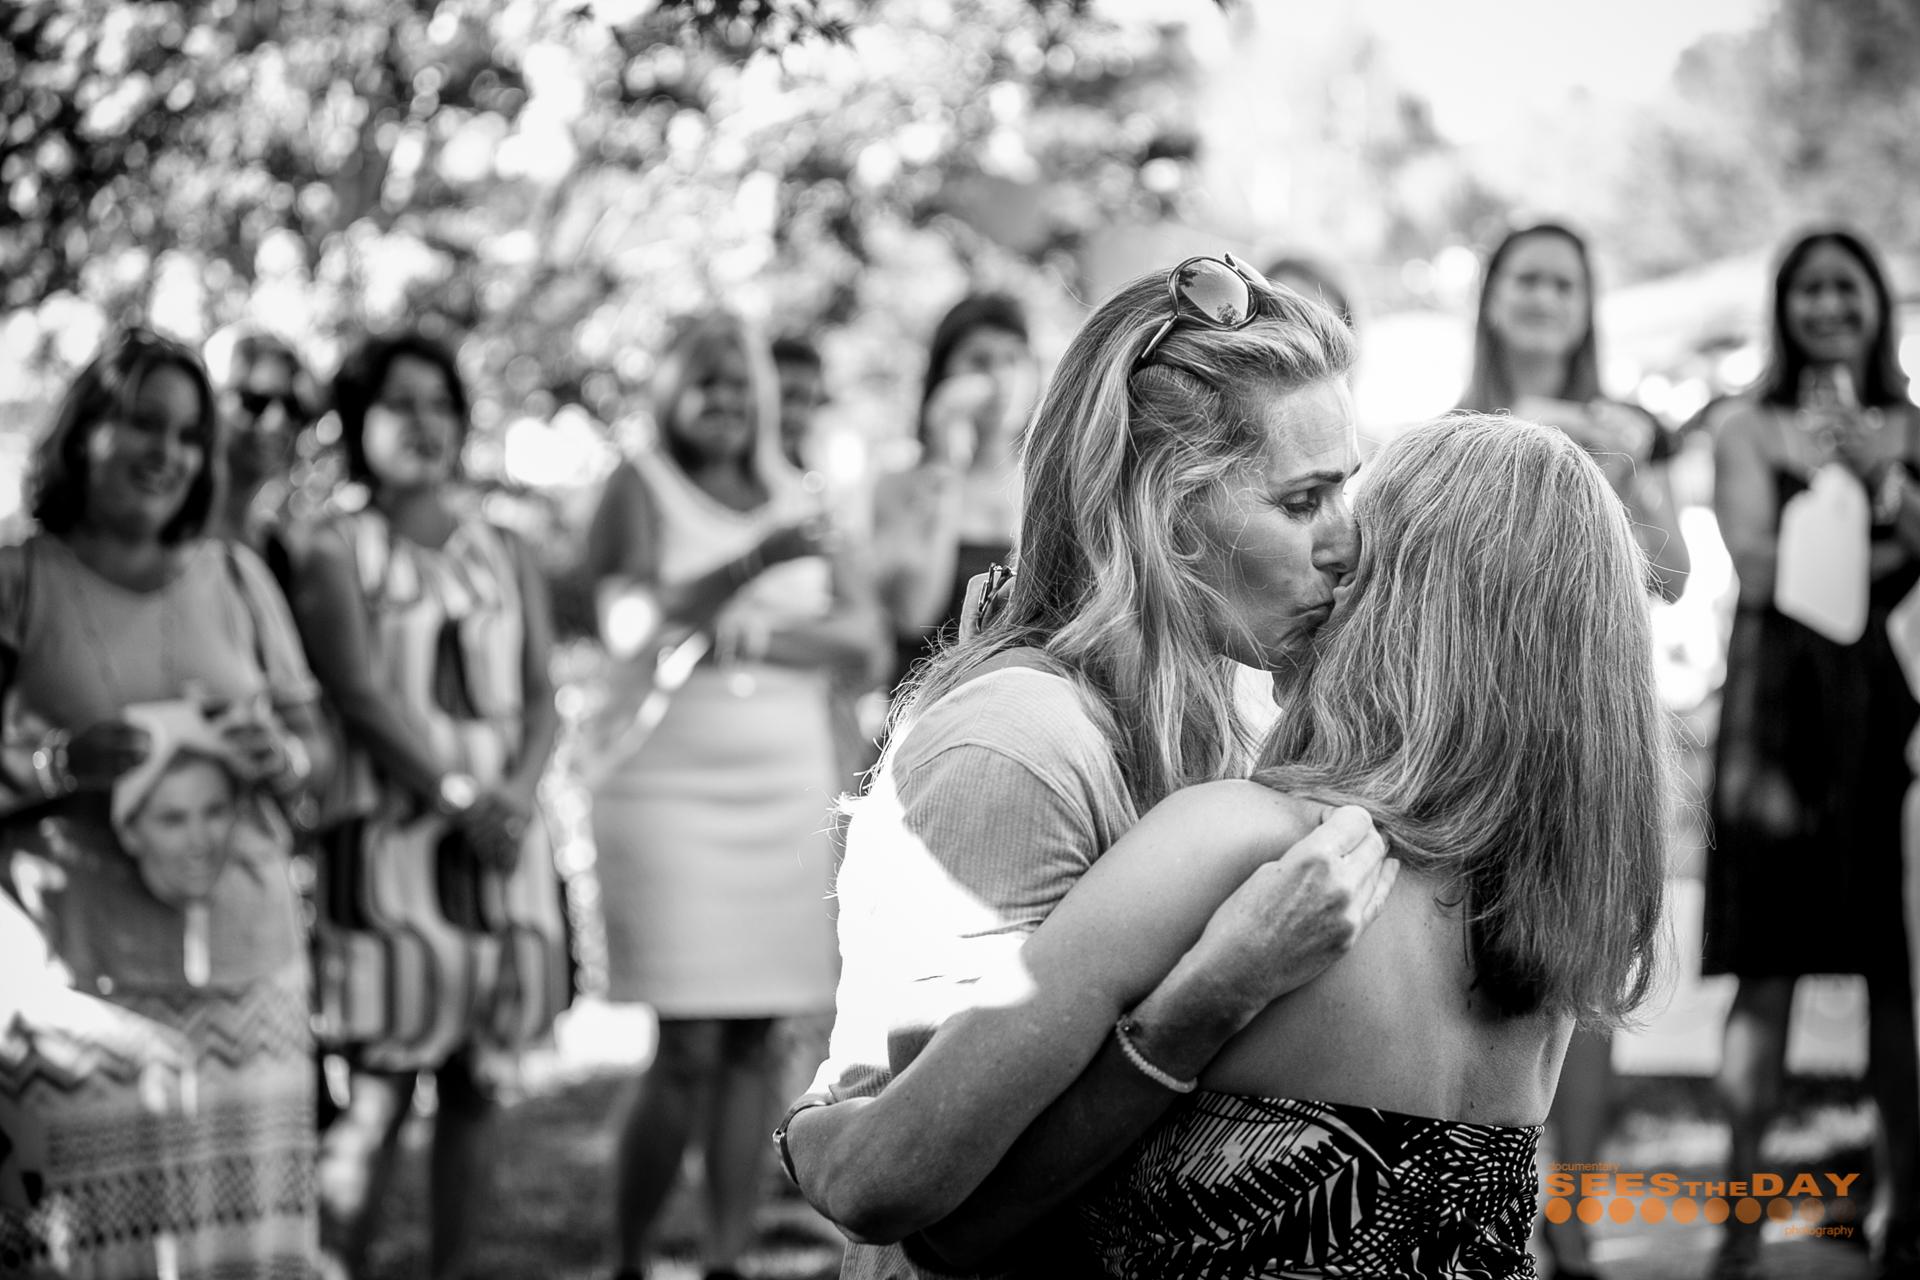 San_Francisco_Wedding_Photographer_Sees_The_Day_005.jpg